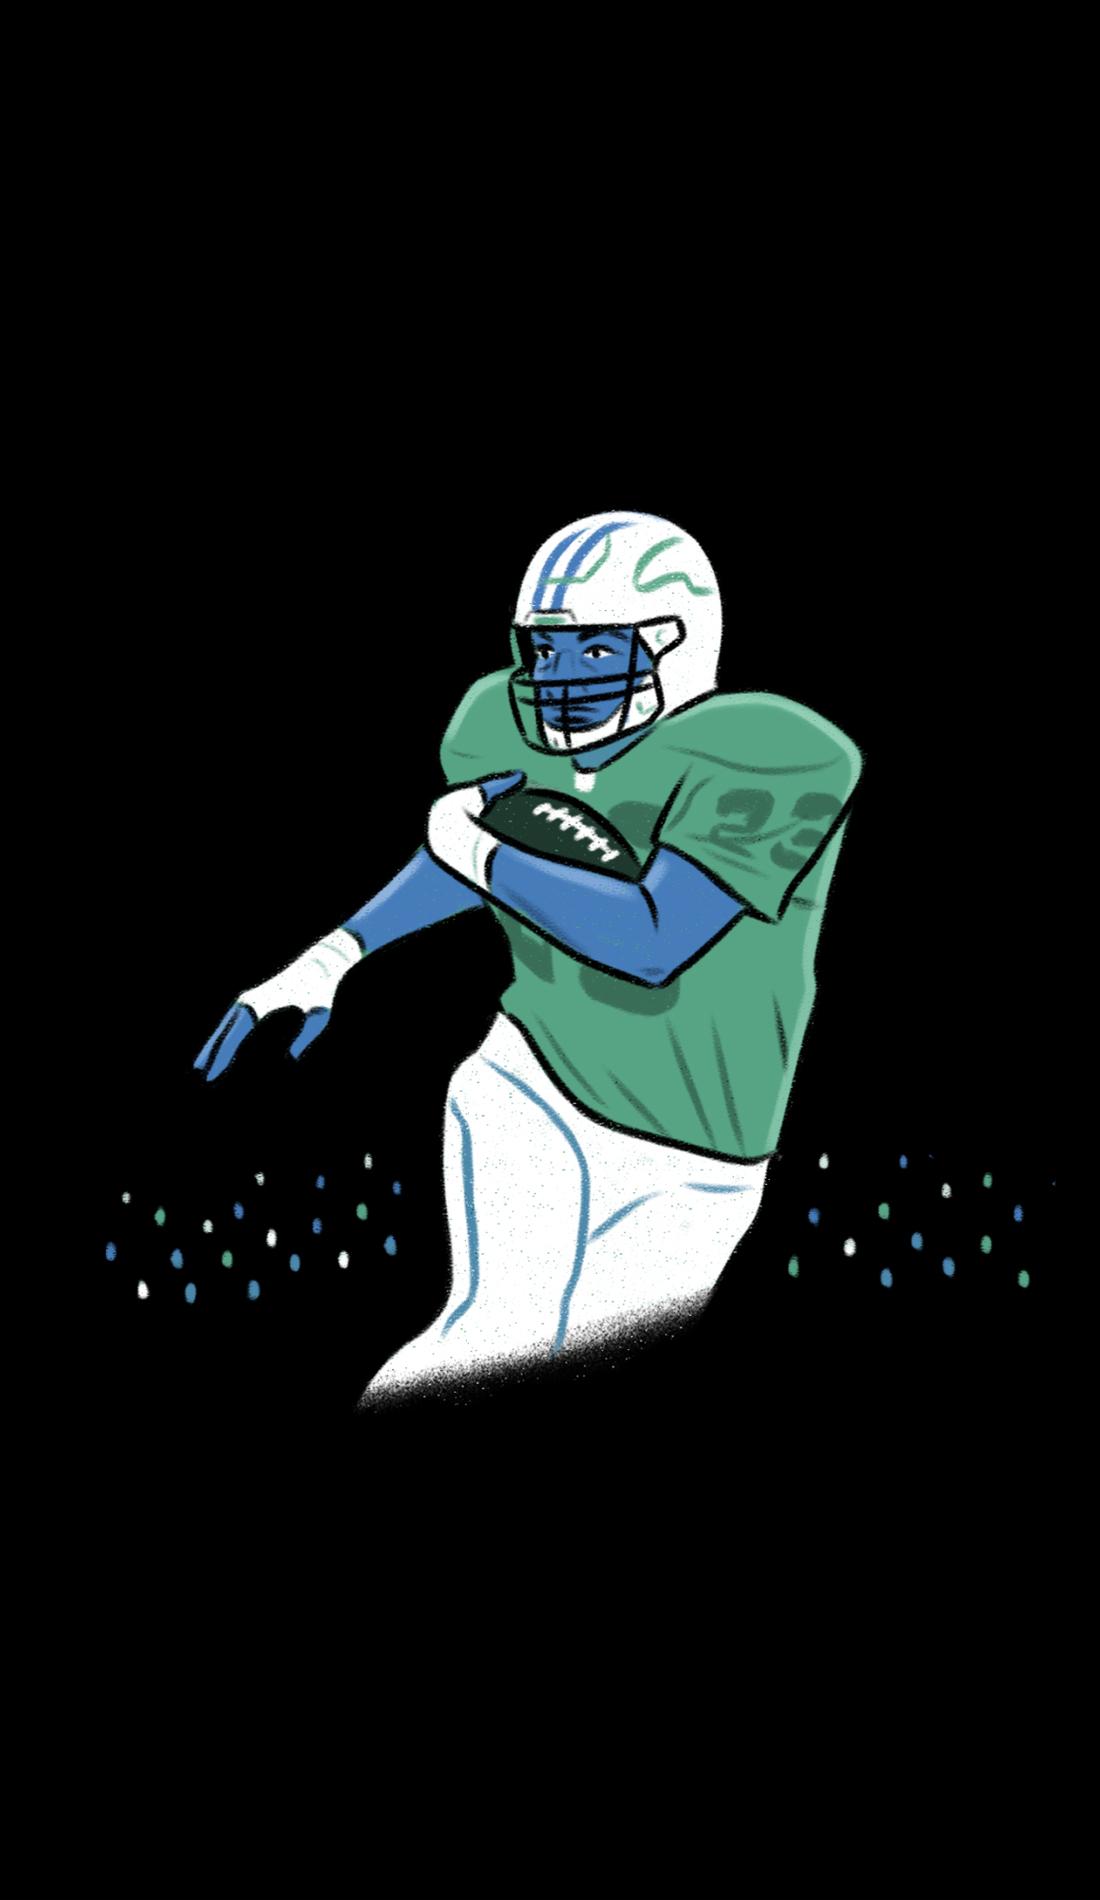 A University of Louisiana Monroe Warhawks Football live event